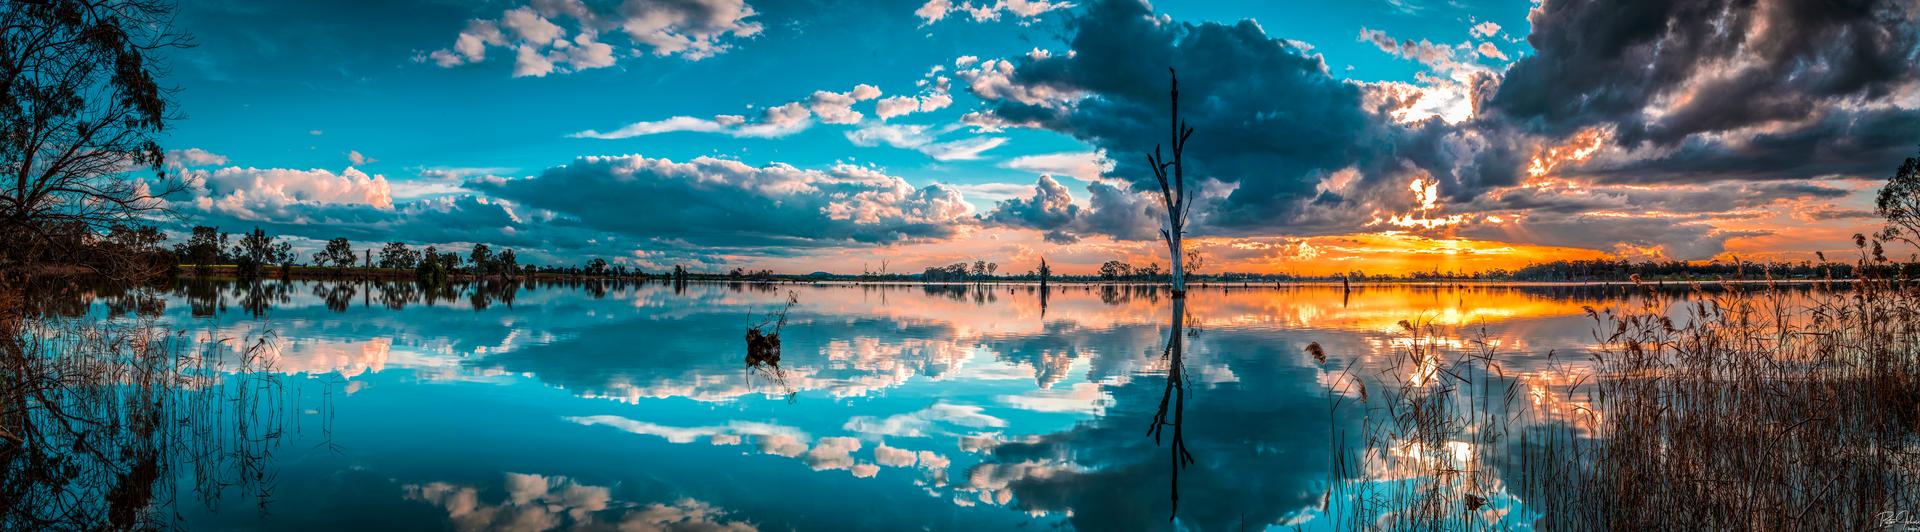 Lake Nagambie, Victoria